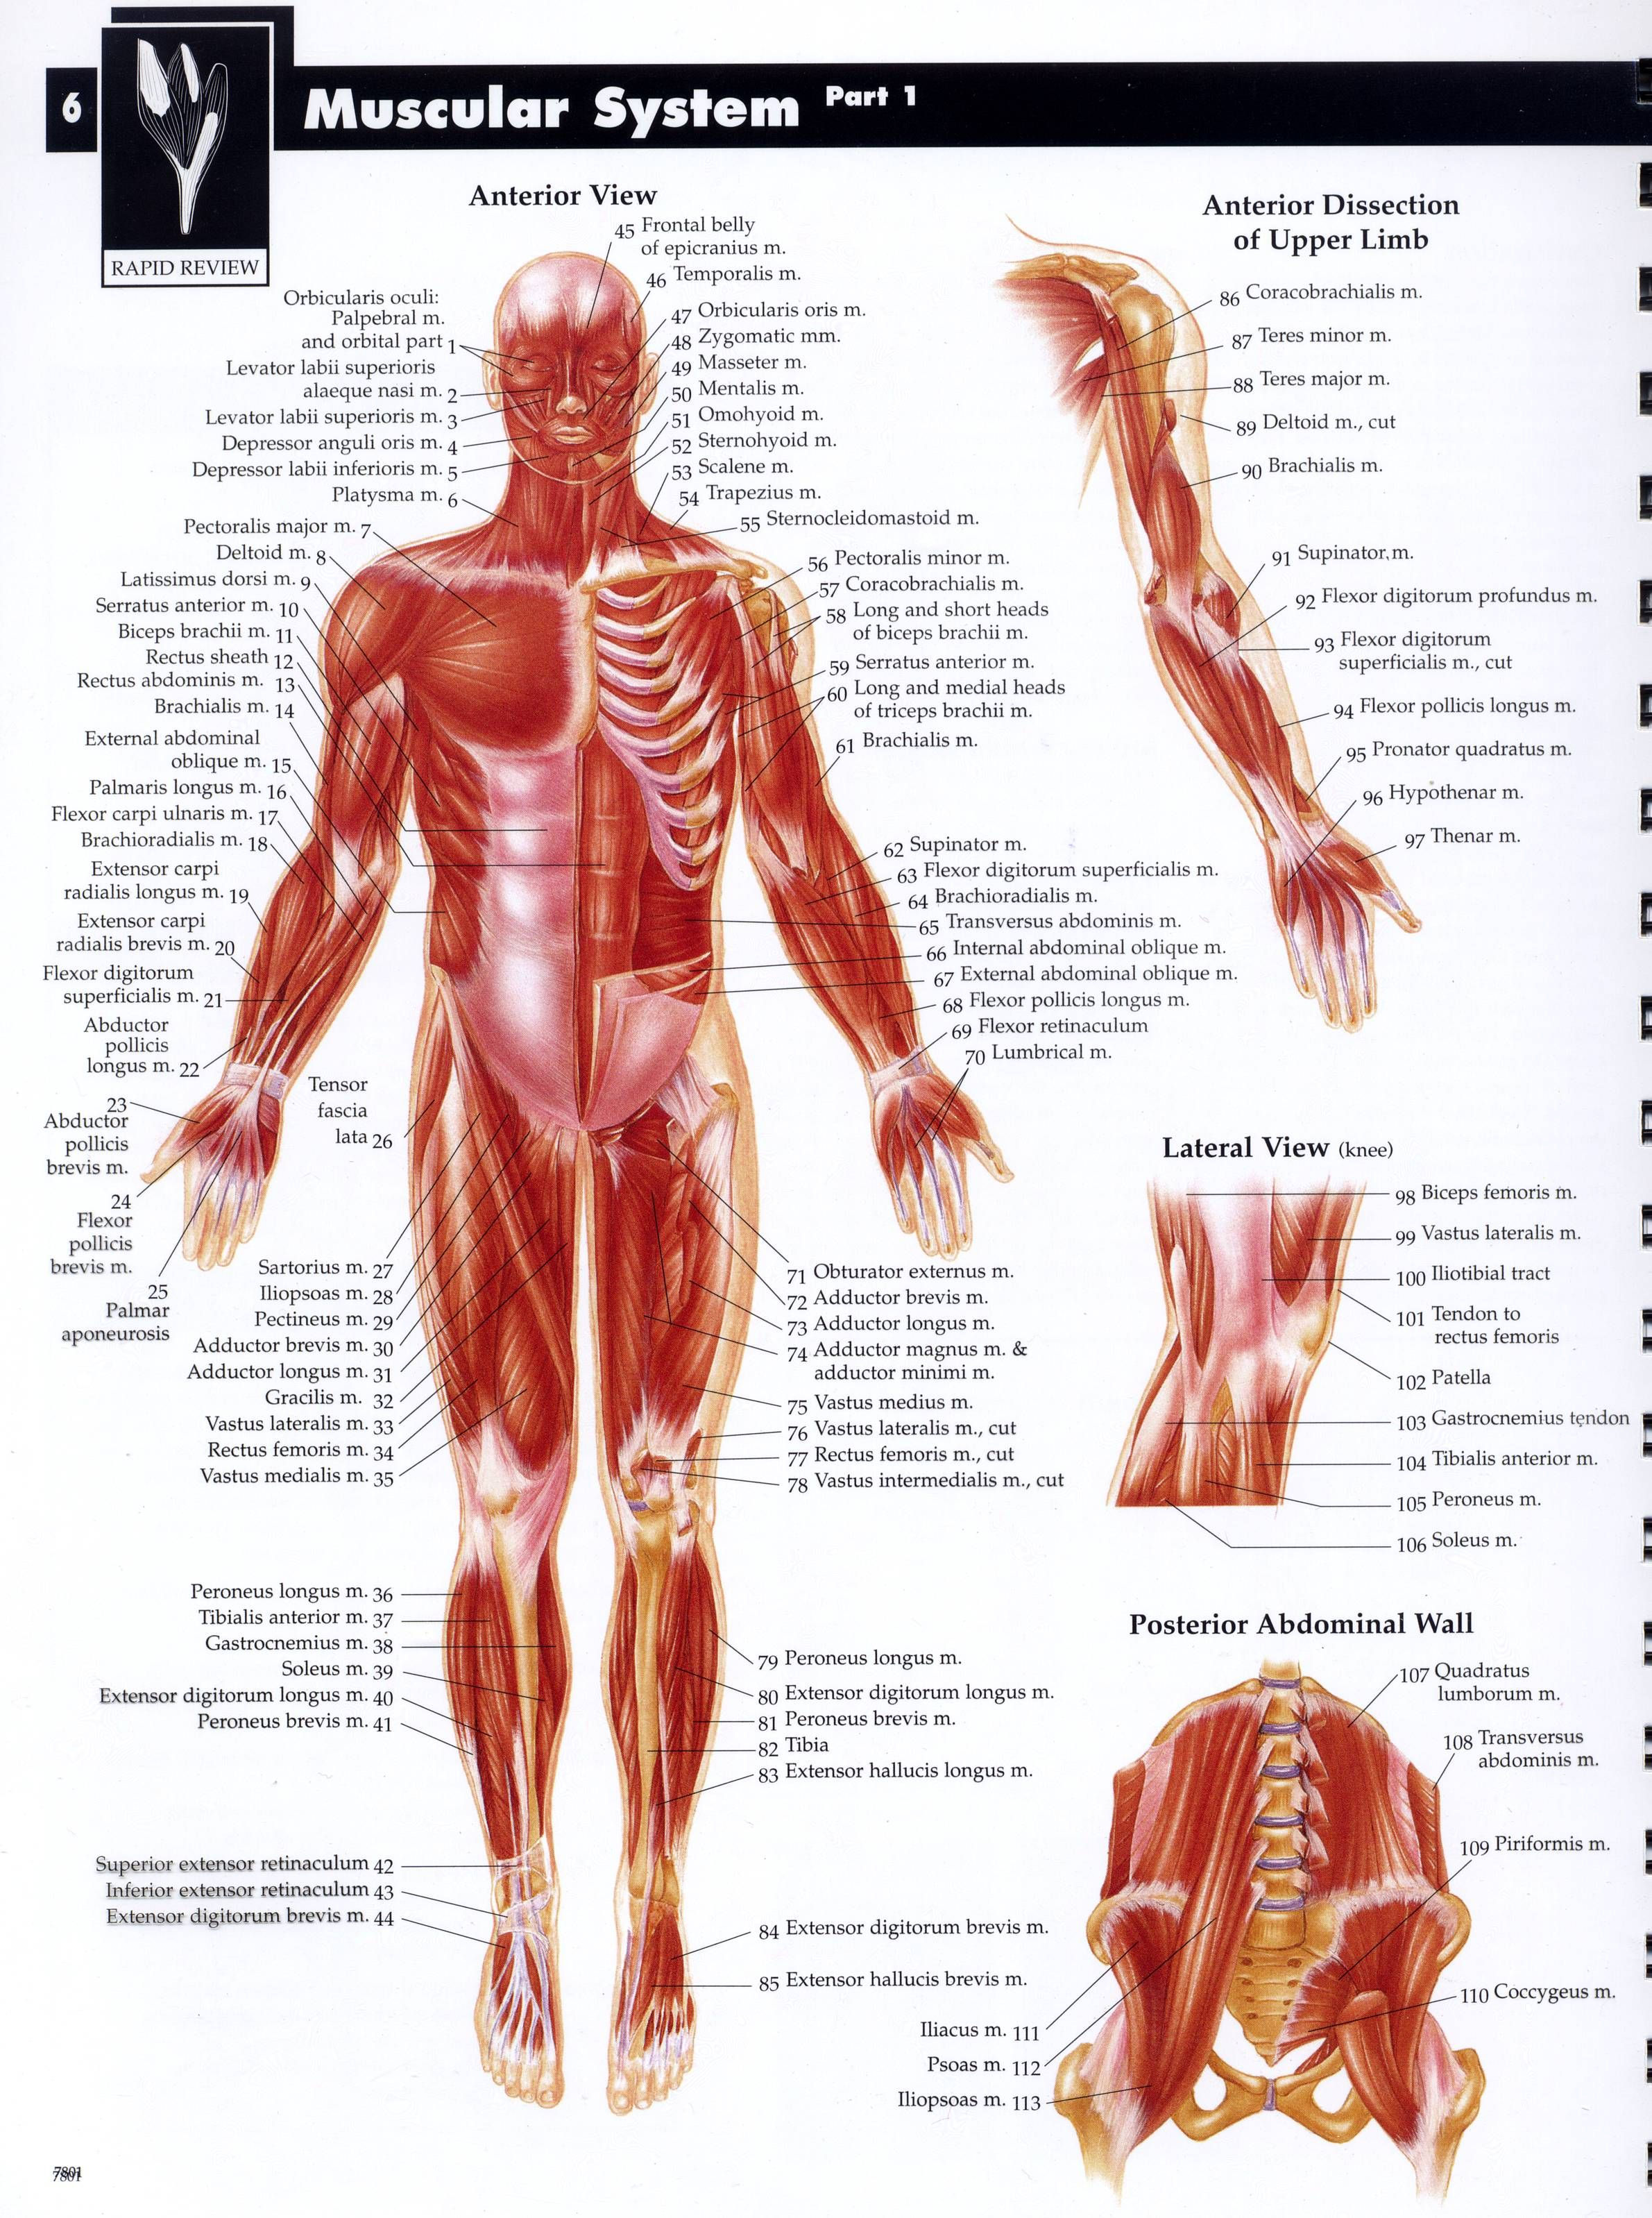 muskular system   Drawing Tutorials: Bones & Muscles - Human Anatomy ...